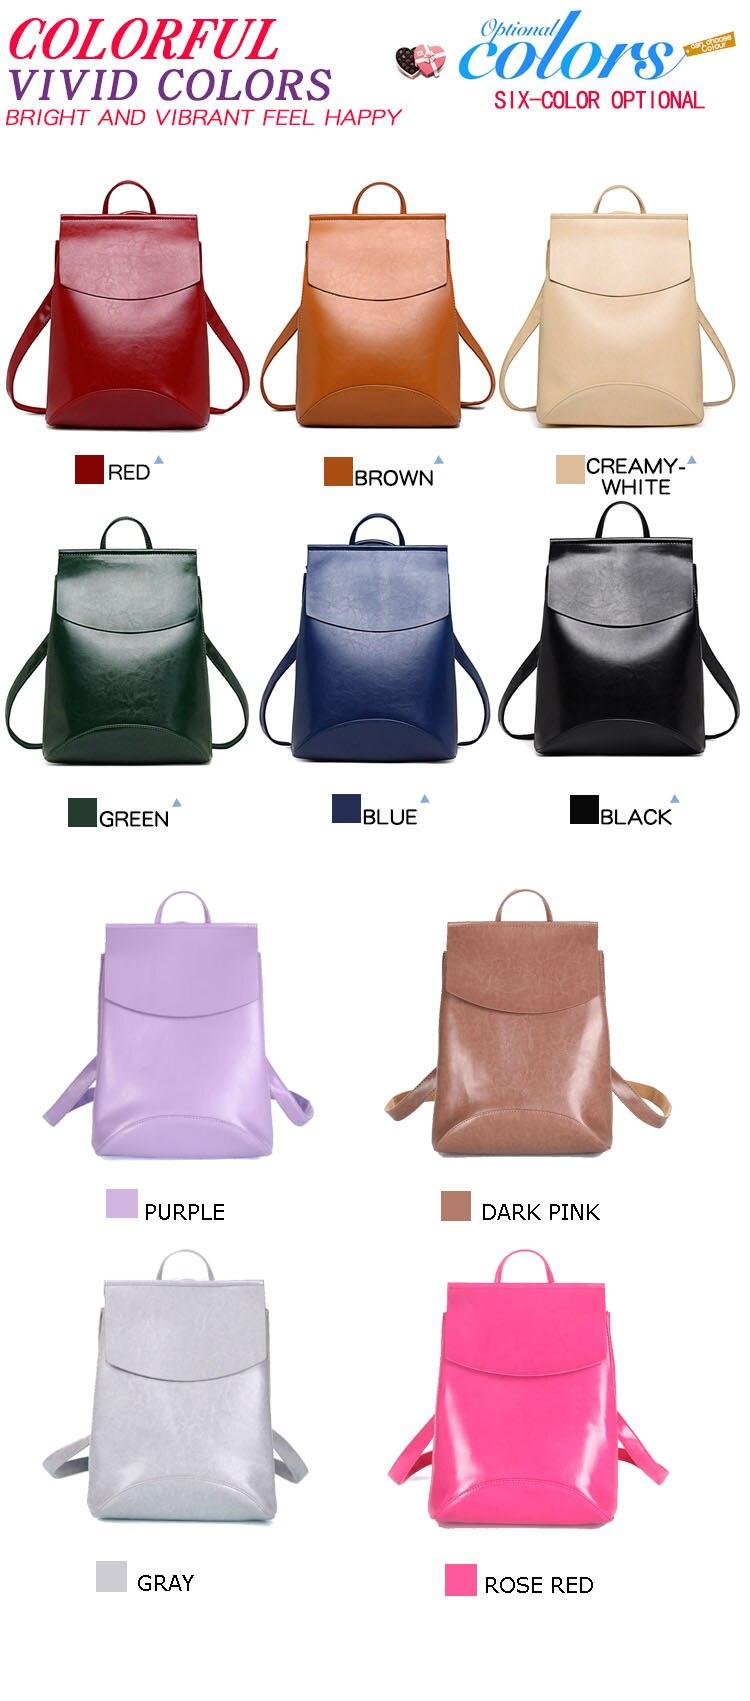 HTB1sMZ1X7SWBuNjSszdq6zeSpXaK 2018 HOT Fashion Women Backpack High Quality PU Leather Backpacks for Teenage Girls Female School Shoulder Bag Bagpack mochila